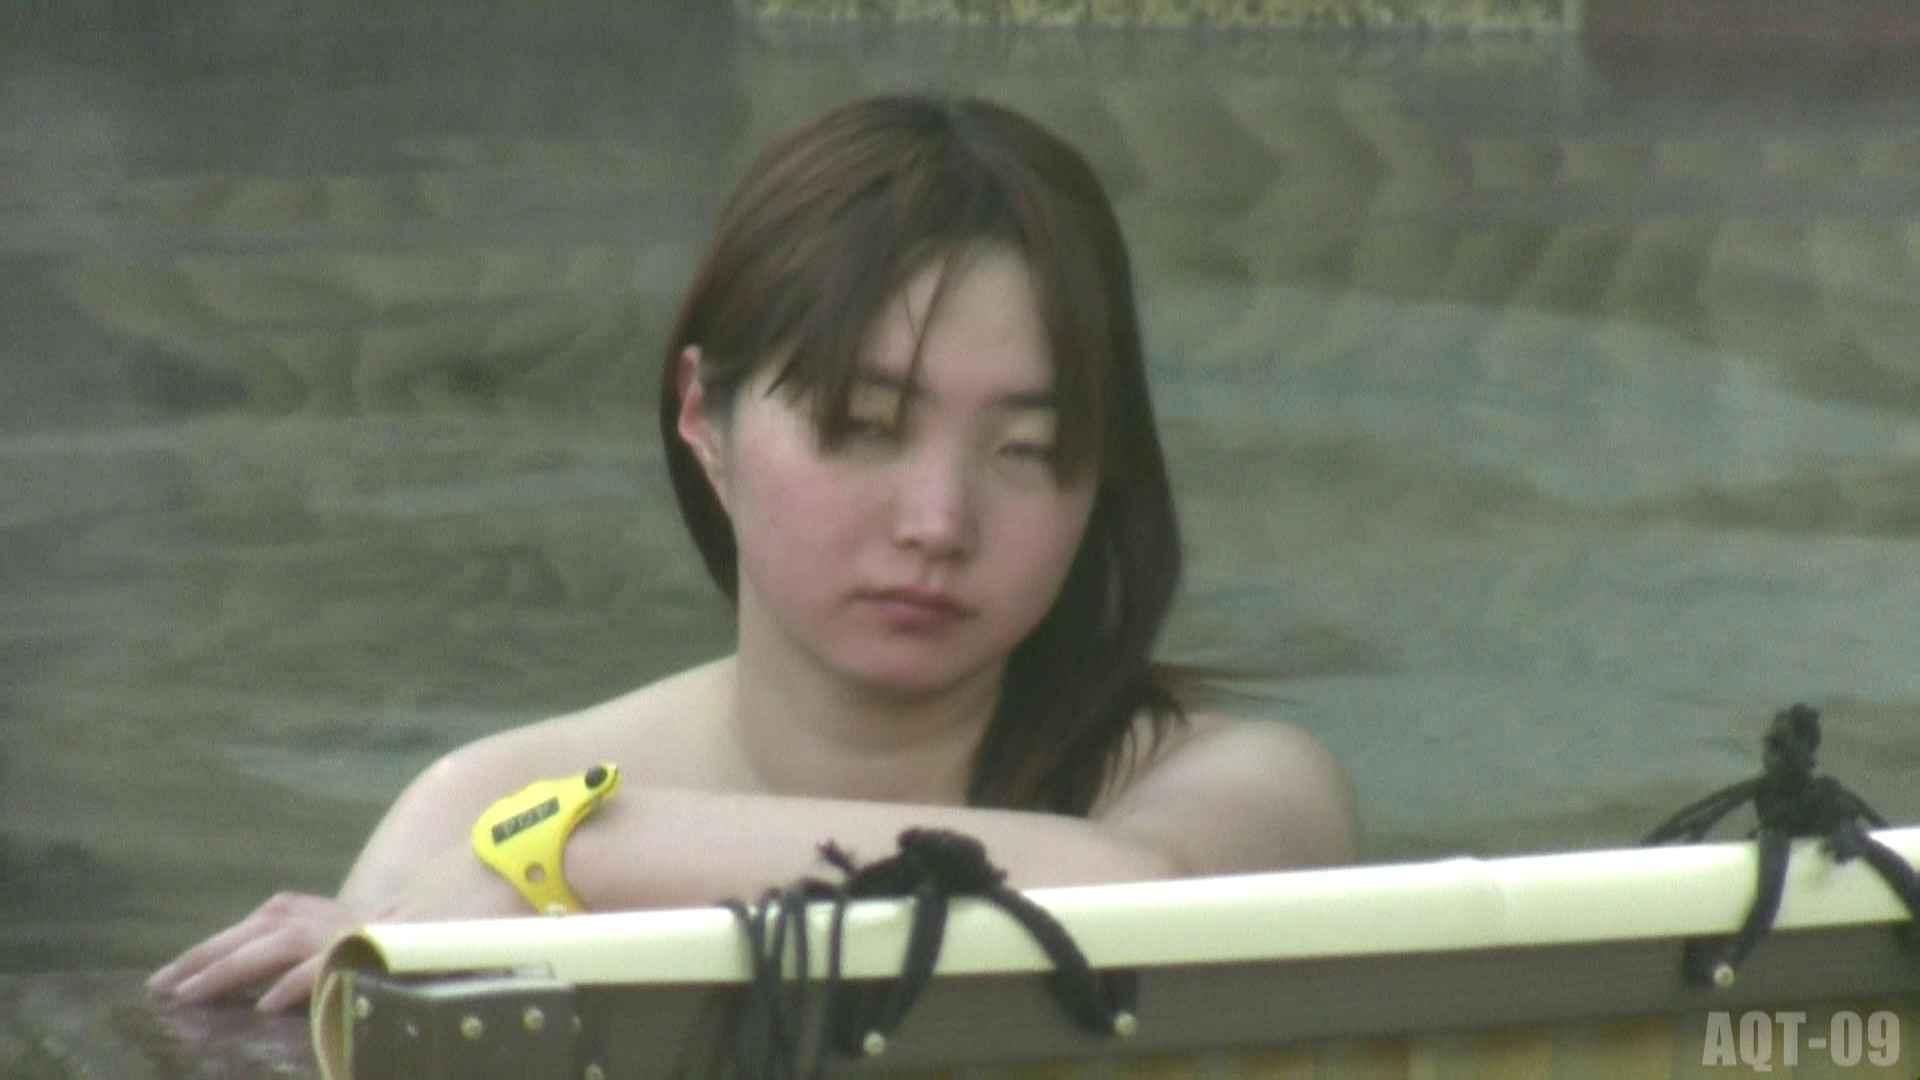 Aquaな露天風呂Vol.781 露天風呂   OLのエロ生活  93連発 79